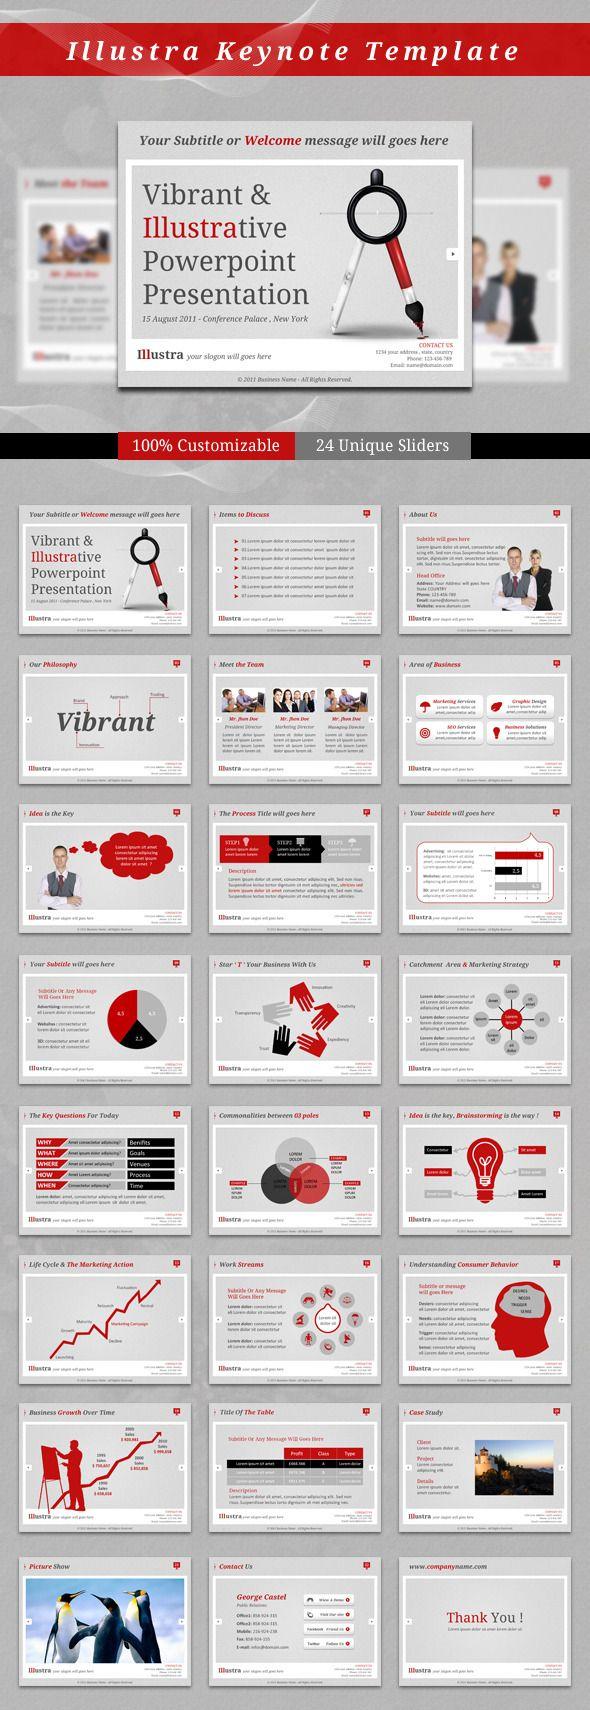 Illustra Keynote Template — Keynote KEY #key file #slides • Available here → https://graphicriver.net/item/illustra-keynote-template/2559785?ref=pxcr